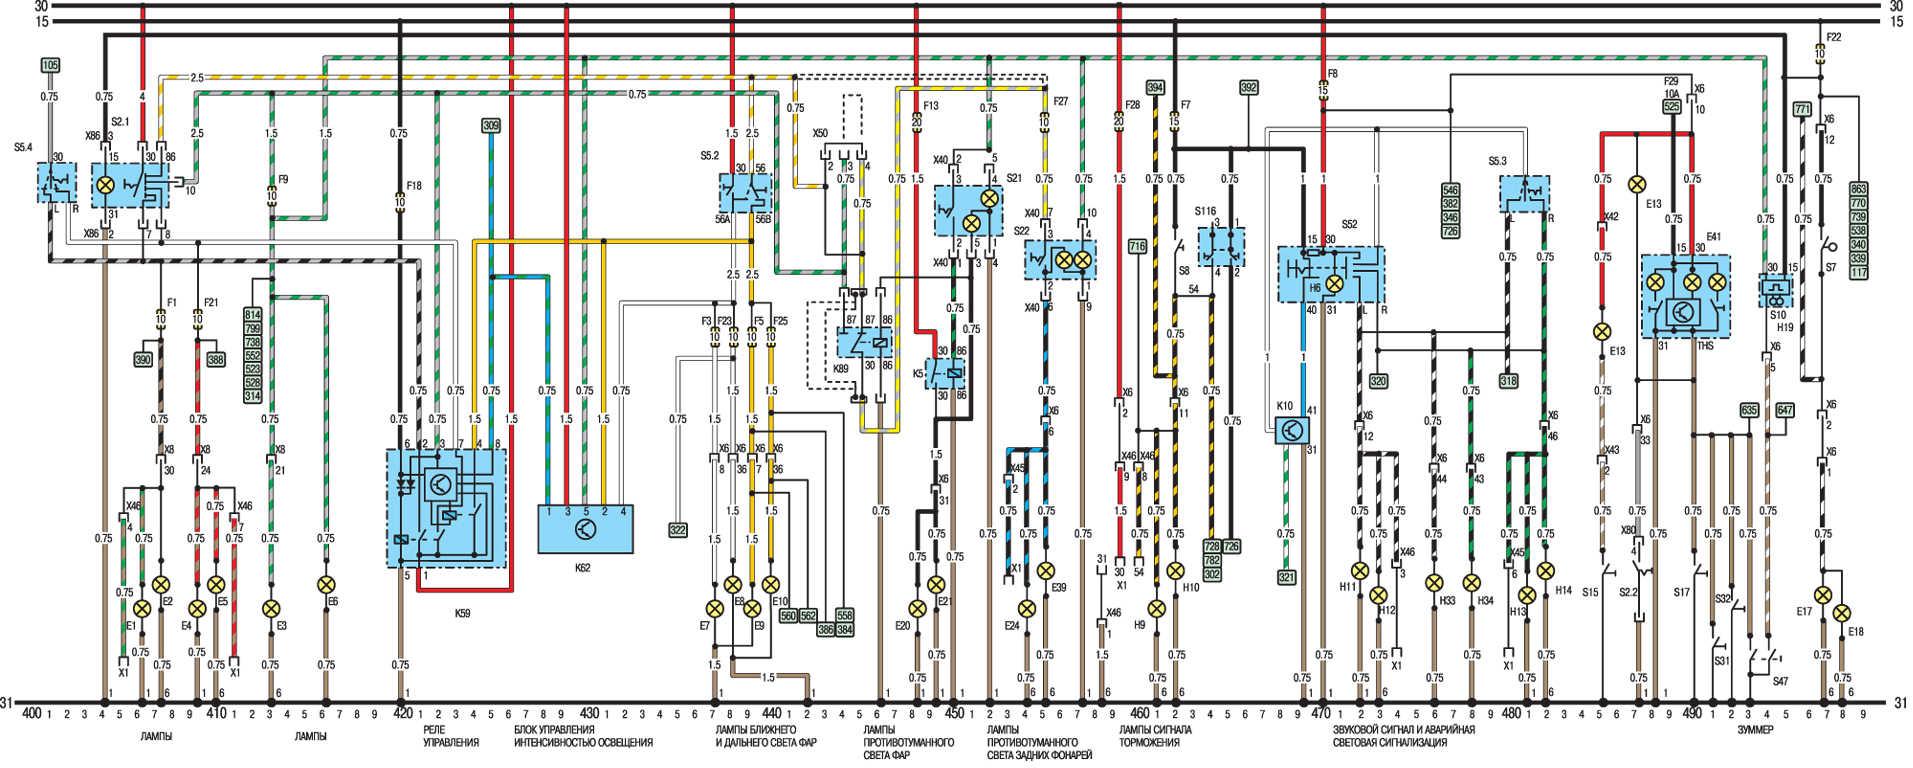 Opel Ascona C Wiring Diagram Diagrams Manta Vectra A U042d U043b U0435 U043a U0442 U0440 U0438 U0447 U0441 U0430 U044f U0445 U043c U043e U0434